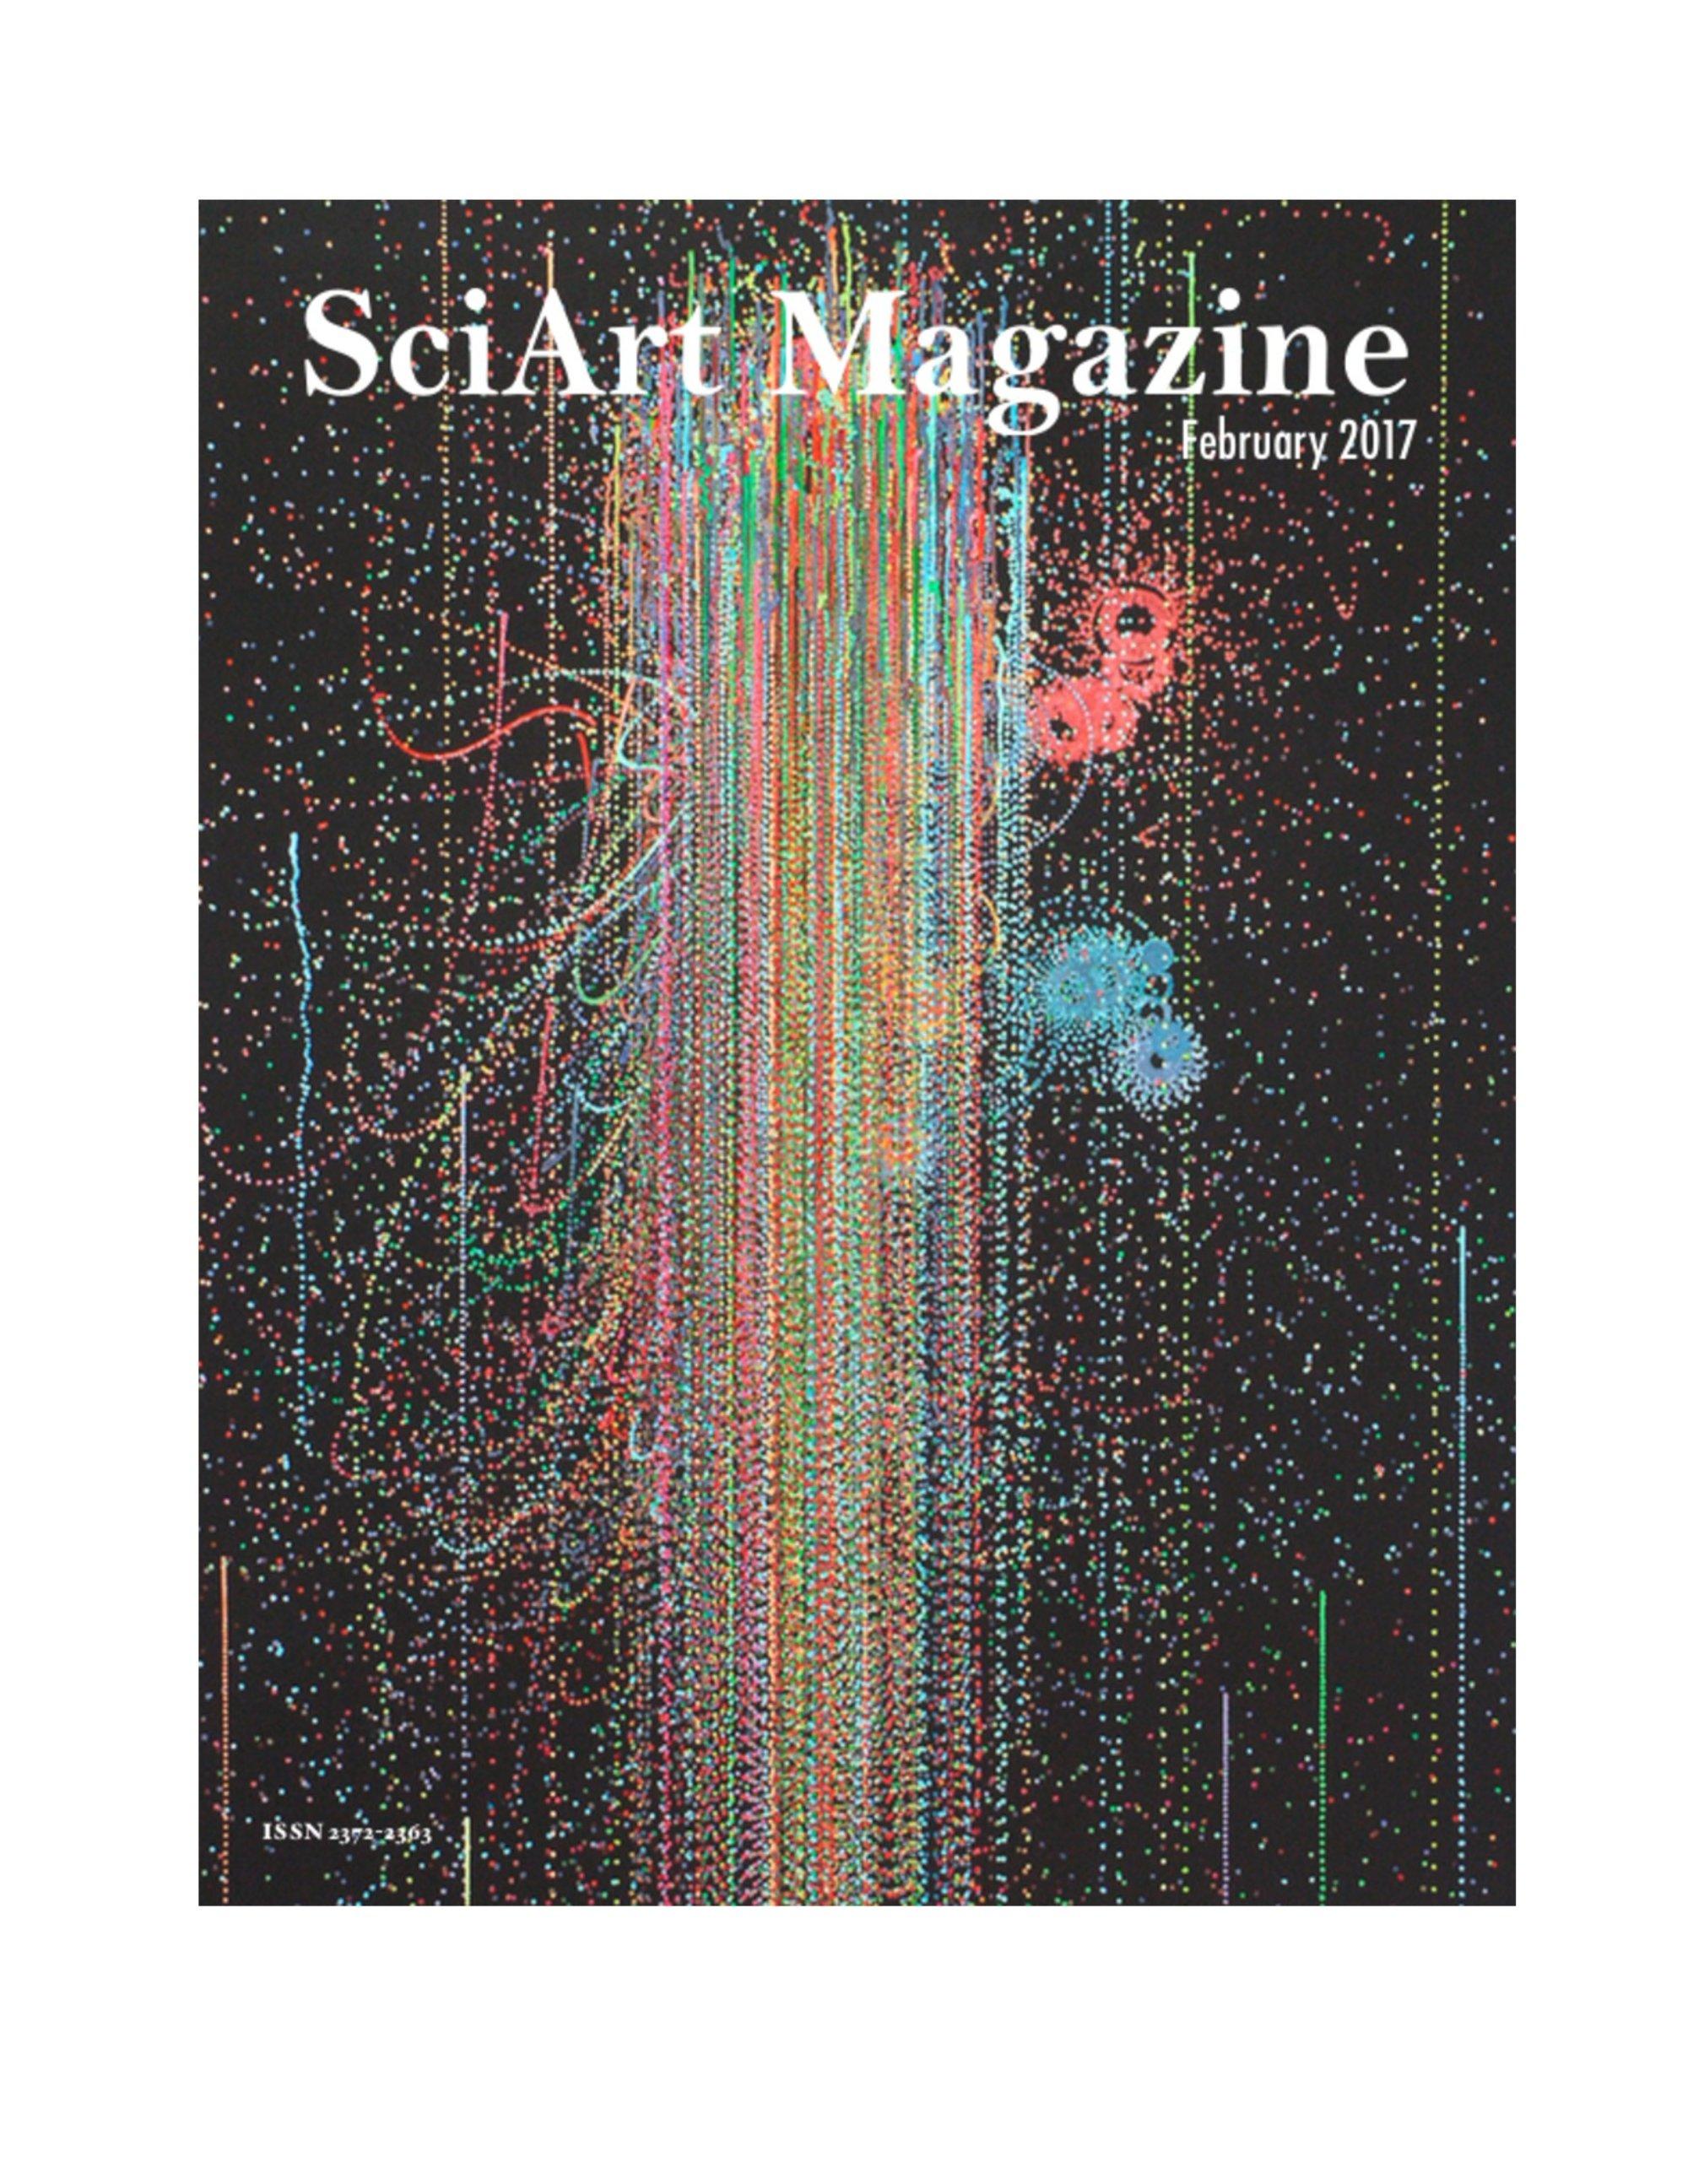 SciArt Magazine - February Issue, 2017